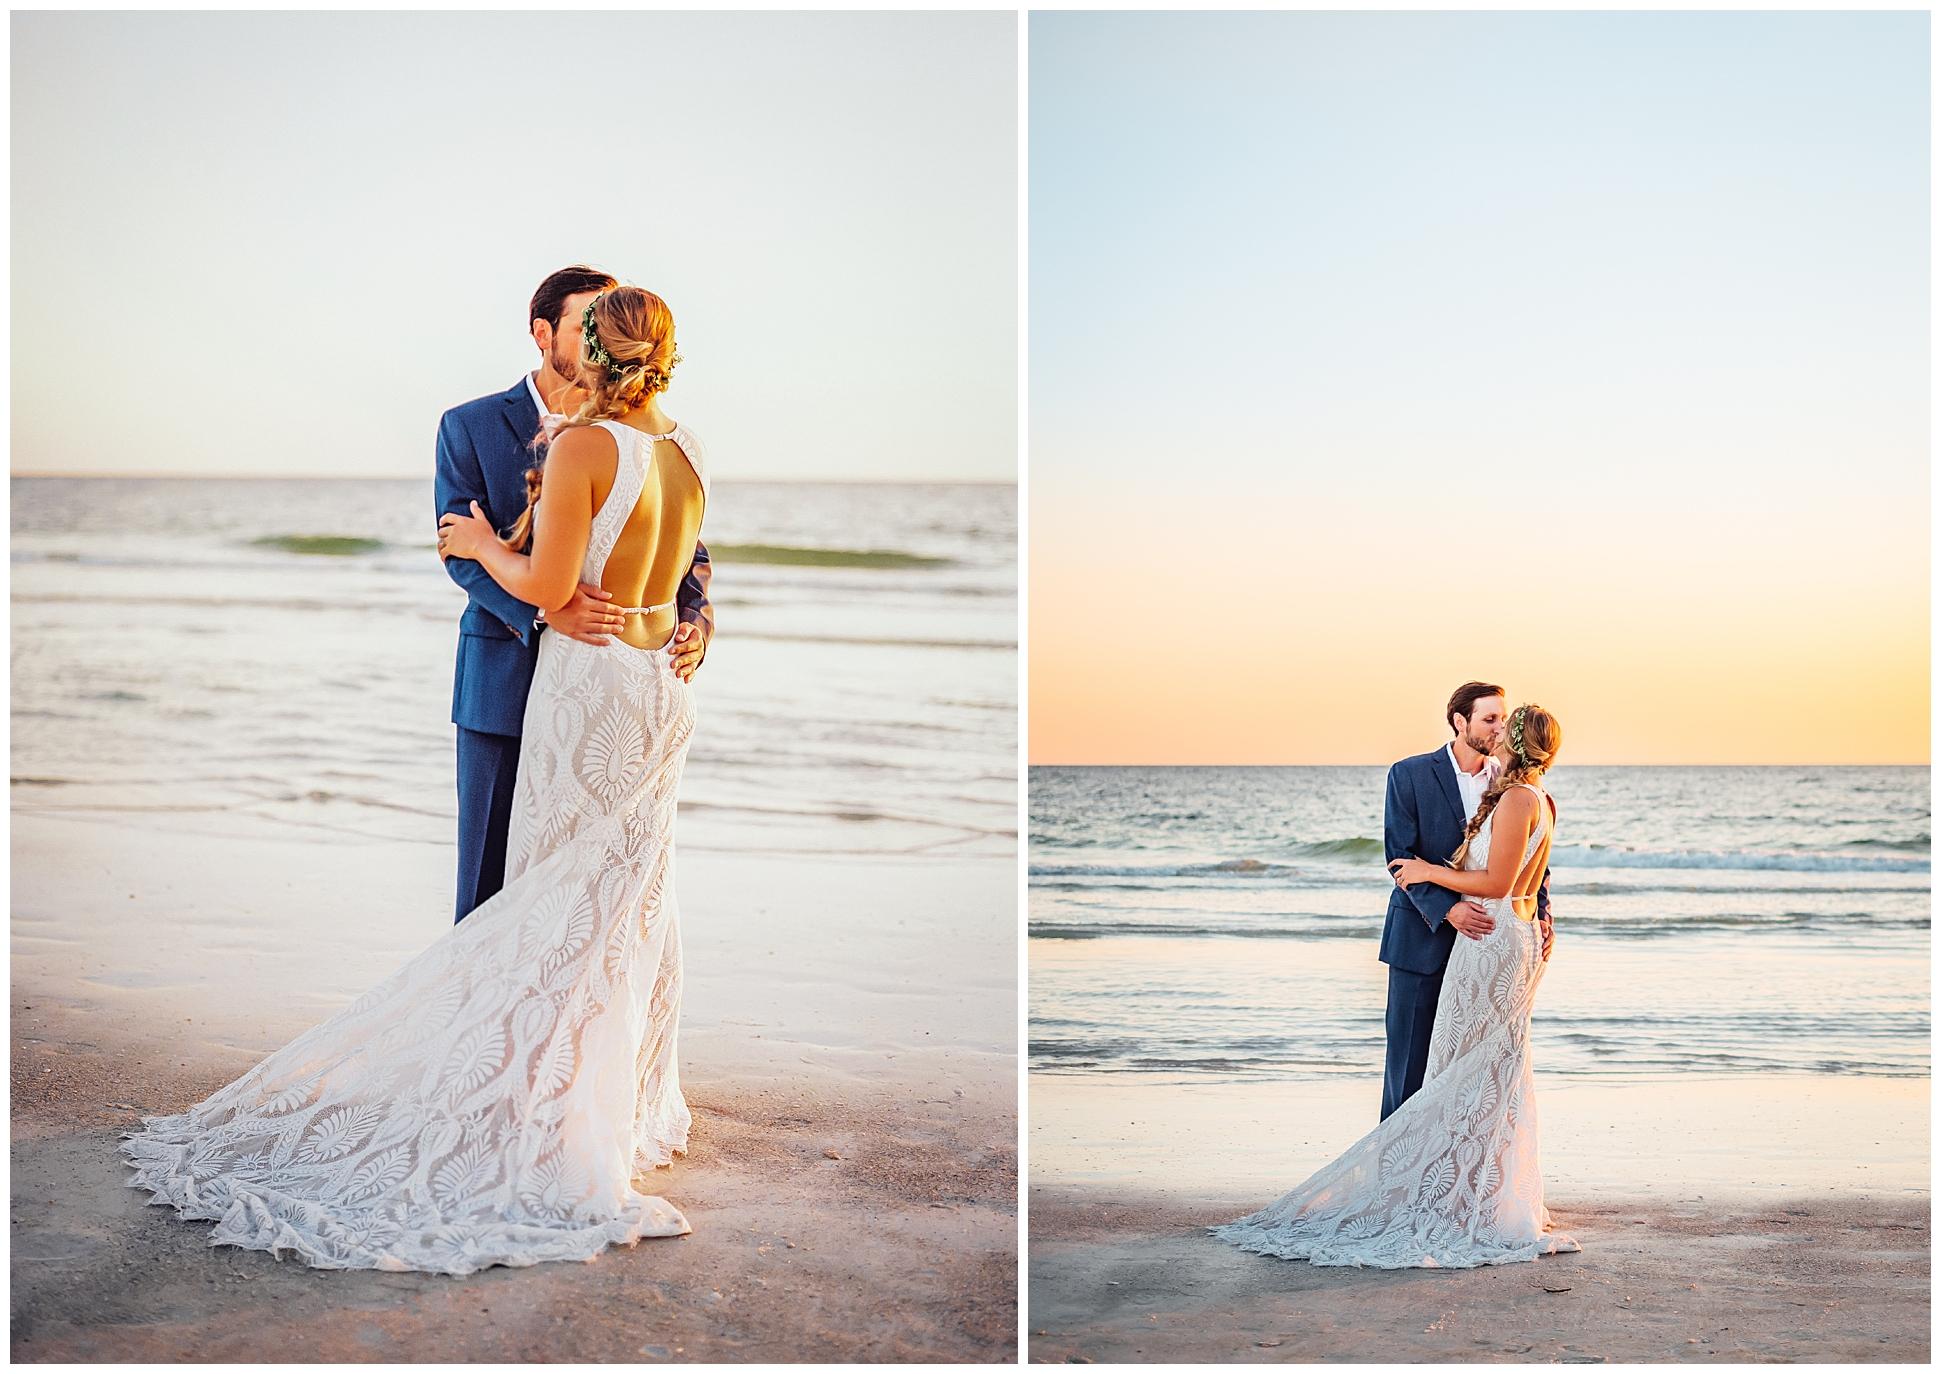 medium-format-film-vs-digital-wedding-photography-florida-beach_0026.jpg